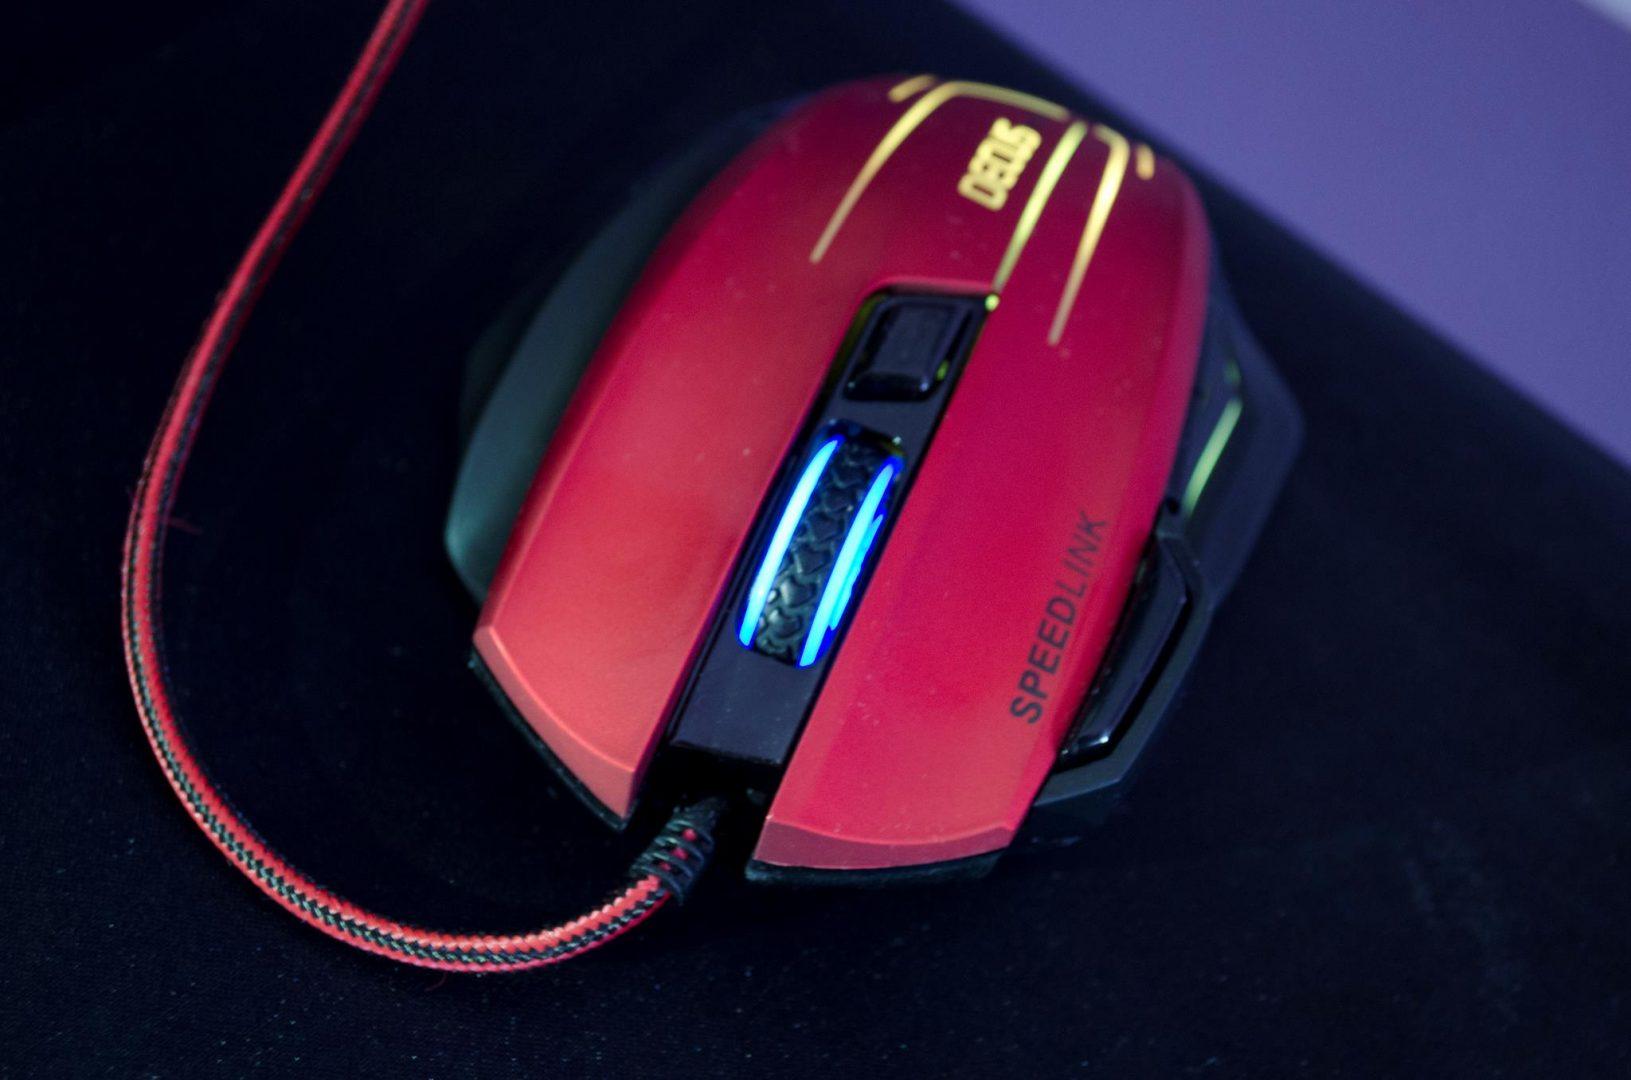 speedlink decus respec gaming mouse review_2